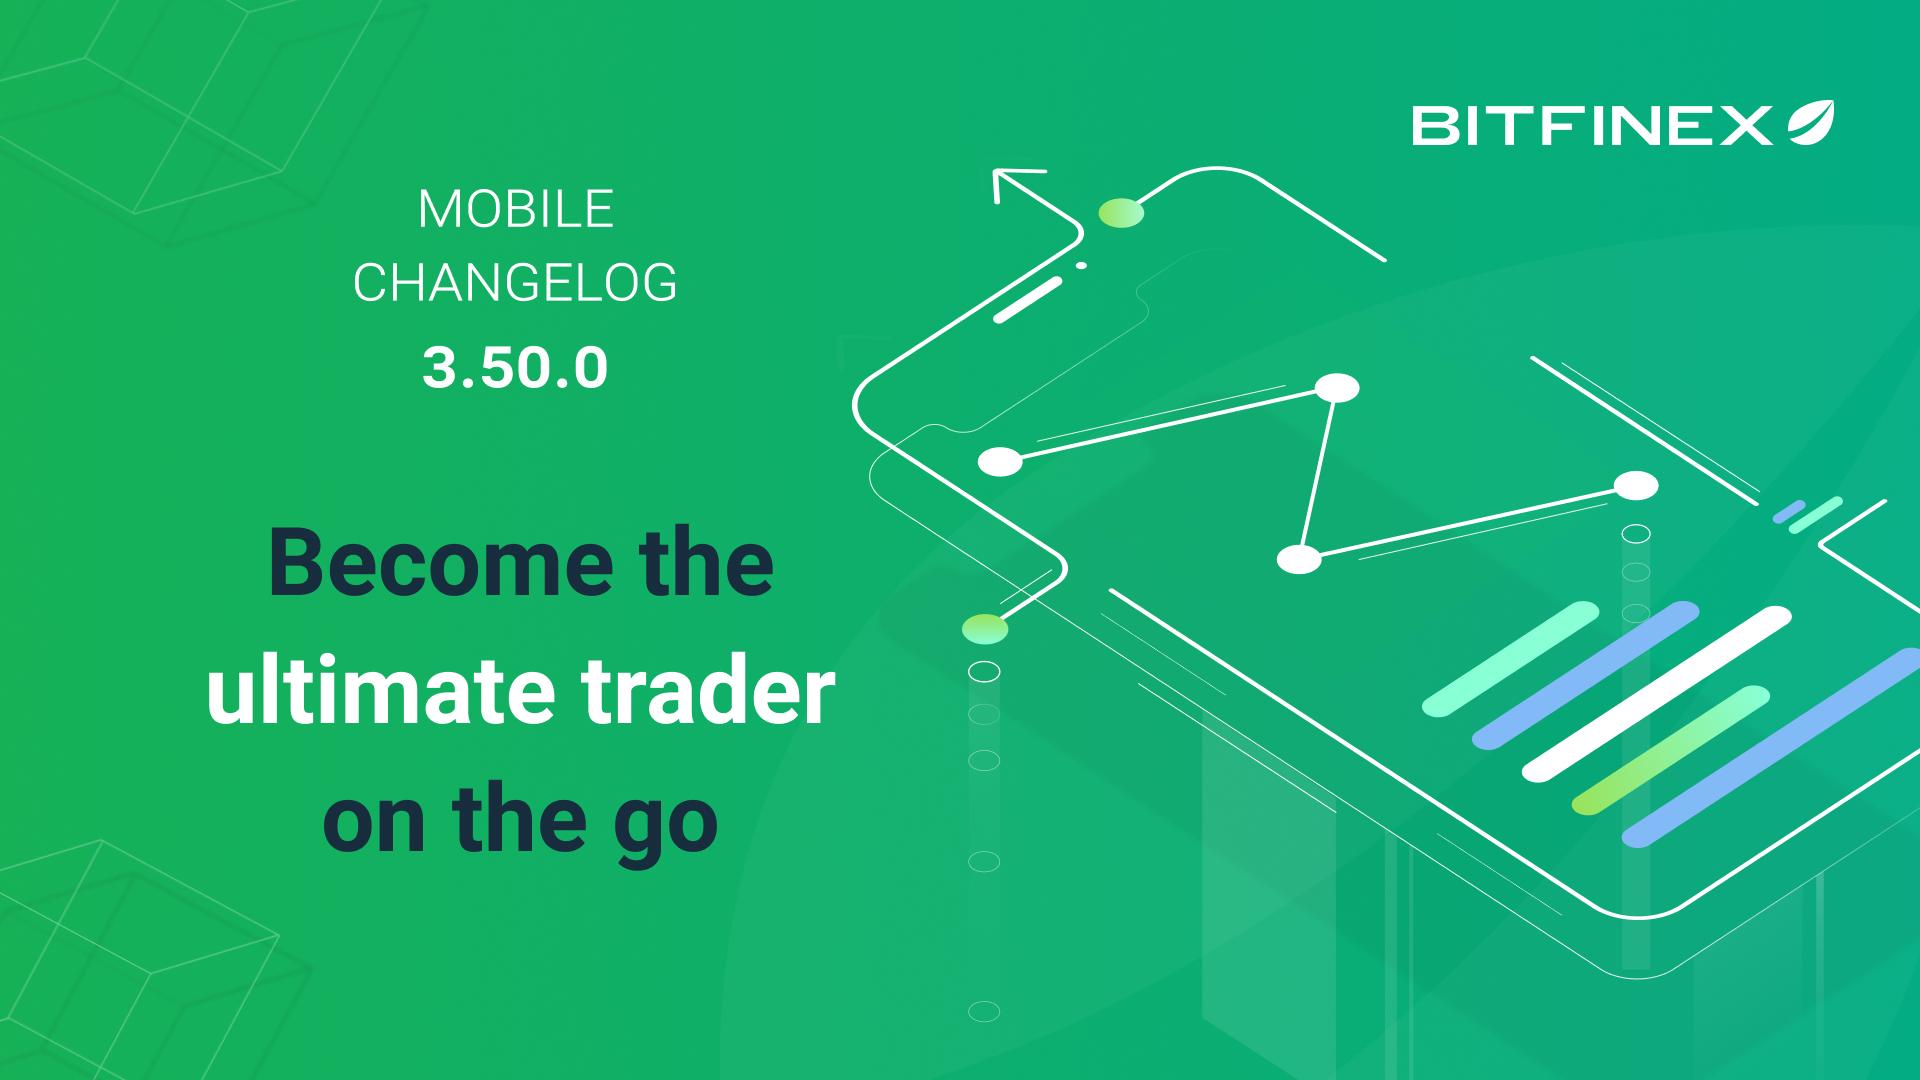 Mobile App Change Log 3.50.0